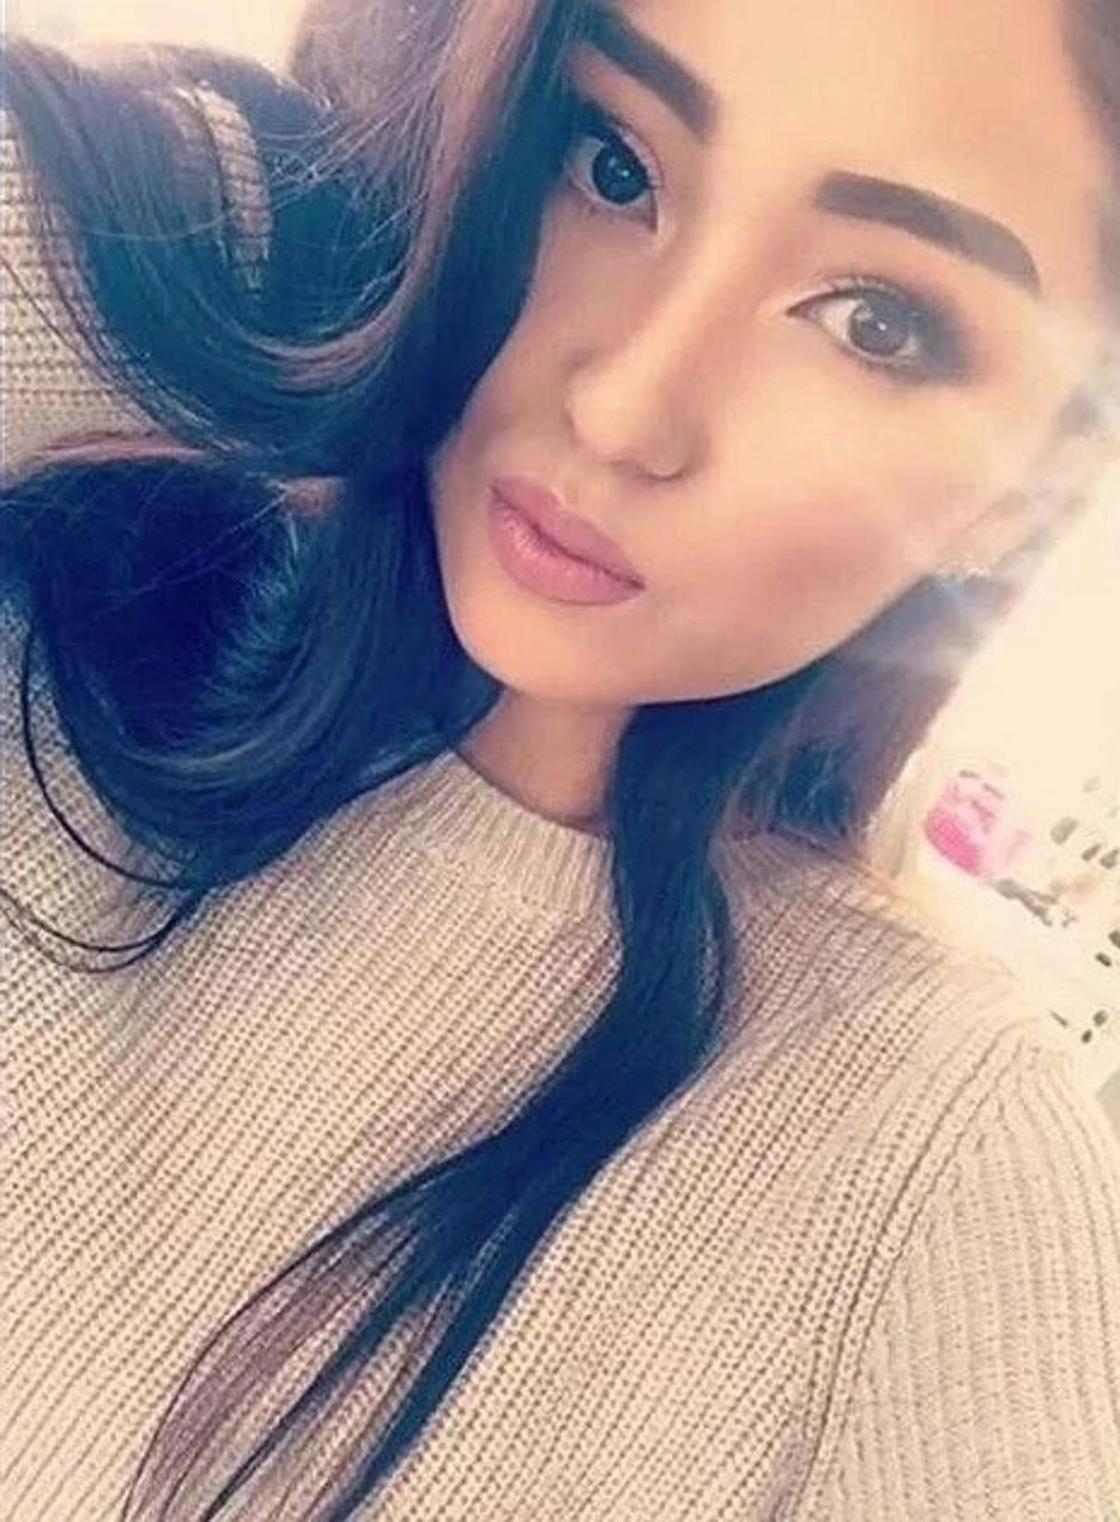 Ақтөбе облысы: Шамуратова Райгүл, 18 жаста (3532 дауыс) - Miss Virtual Aktobe